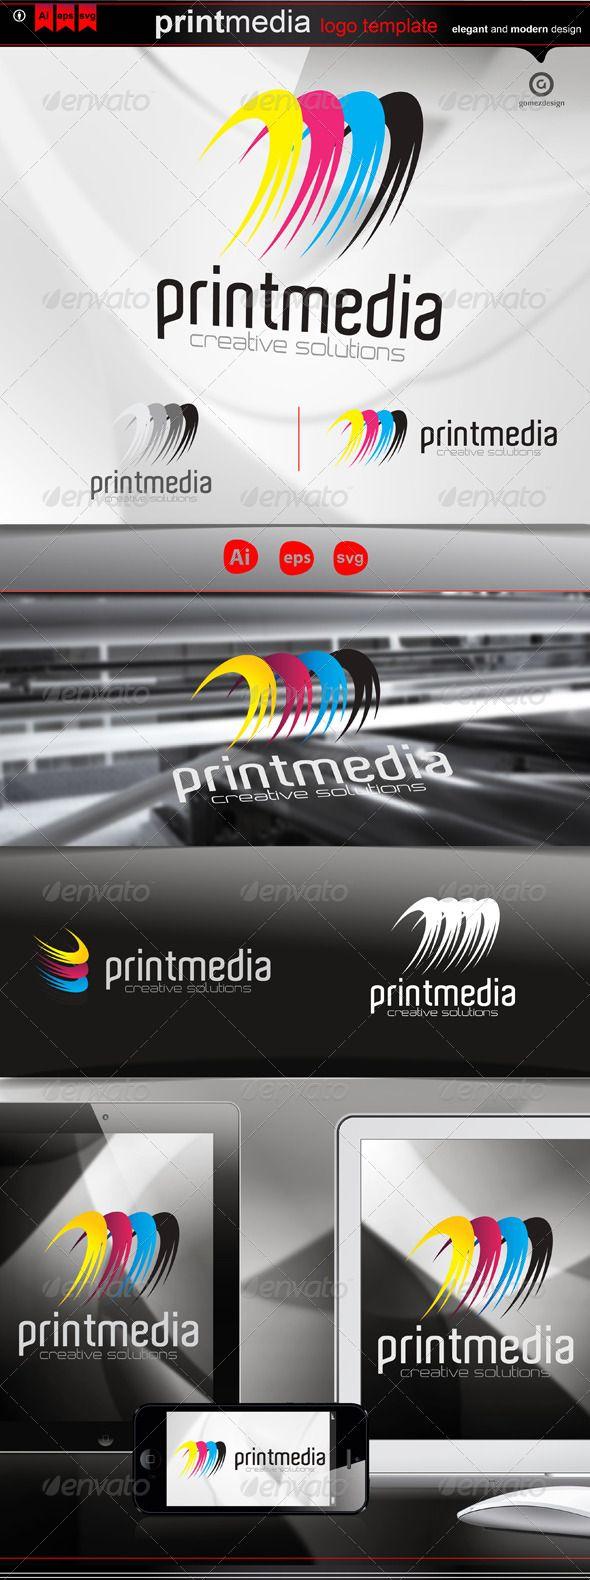 Print media logos logo templates and template print media pronofoot35fo Choice Image